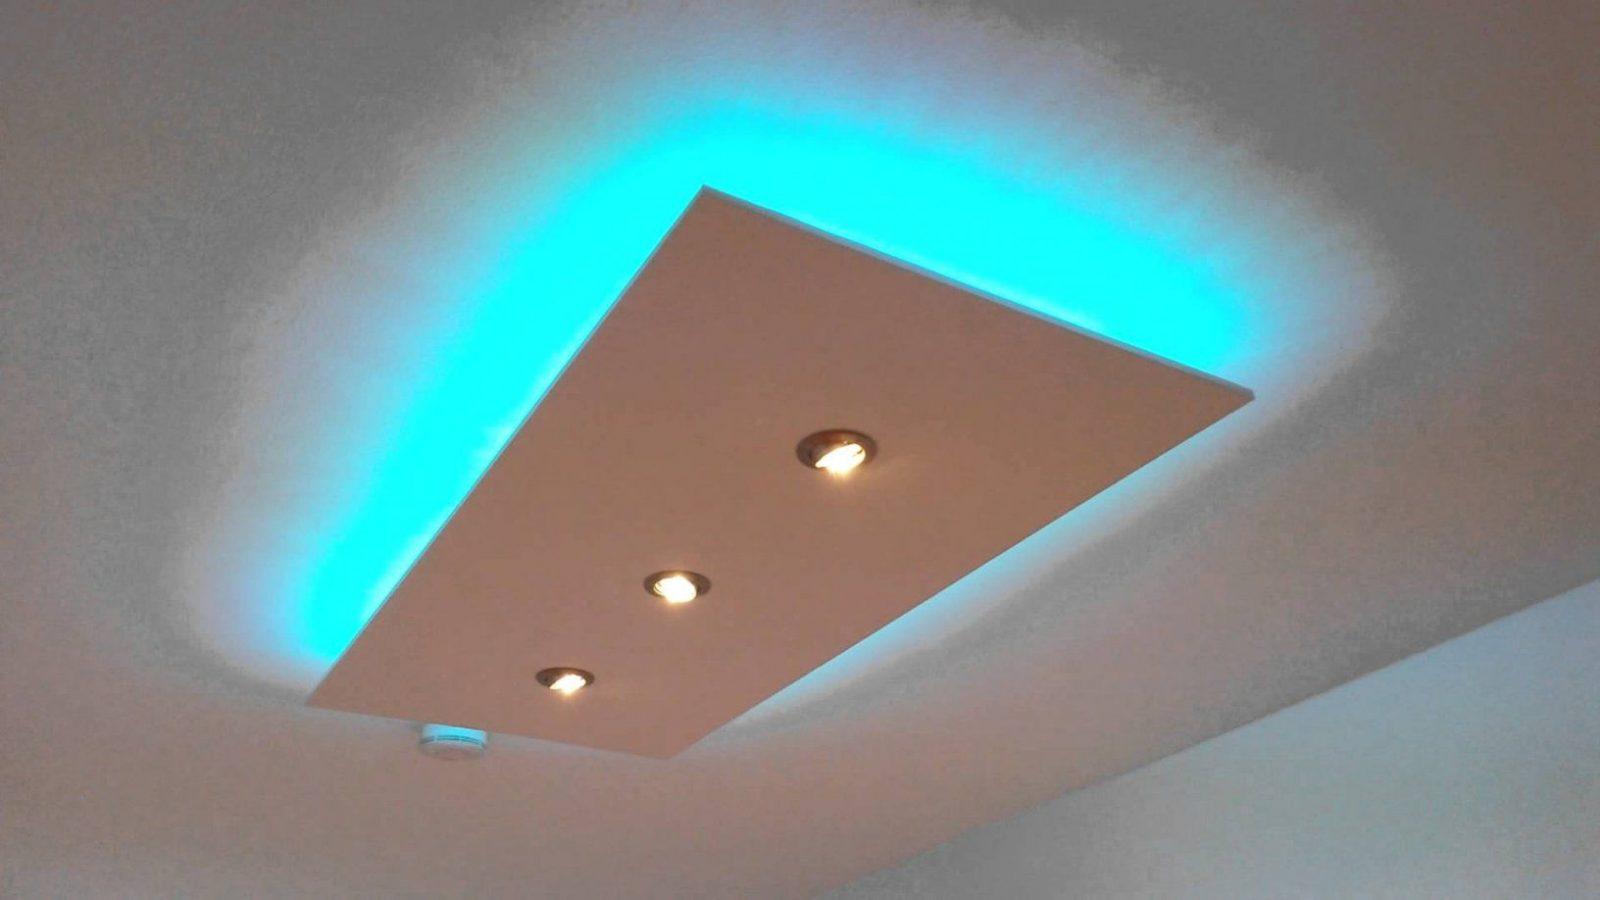 Led Lichtdecke Selber Bauen Mit Bauanleitung Crazy Led Lights von Led Lichtdecke Selber Bauen Bild